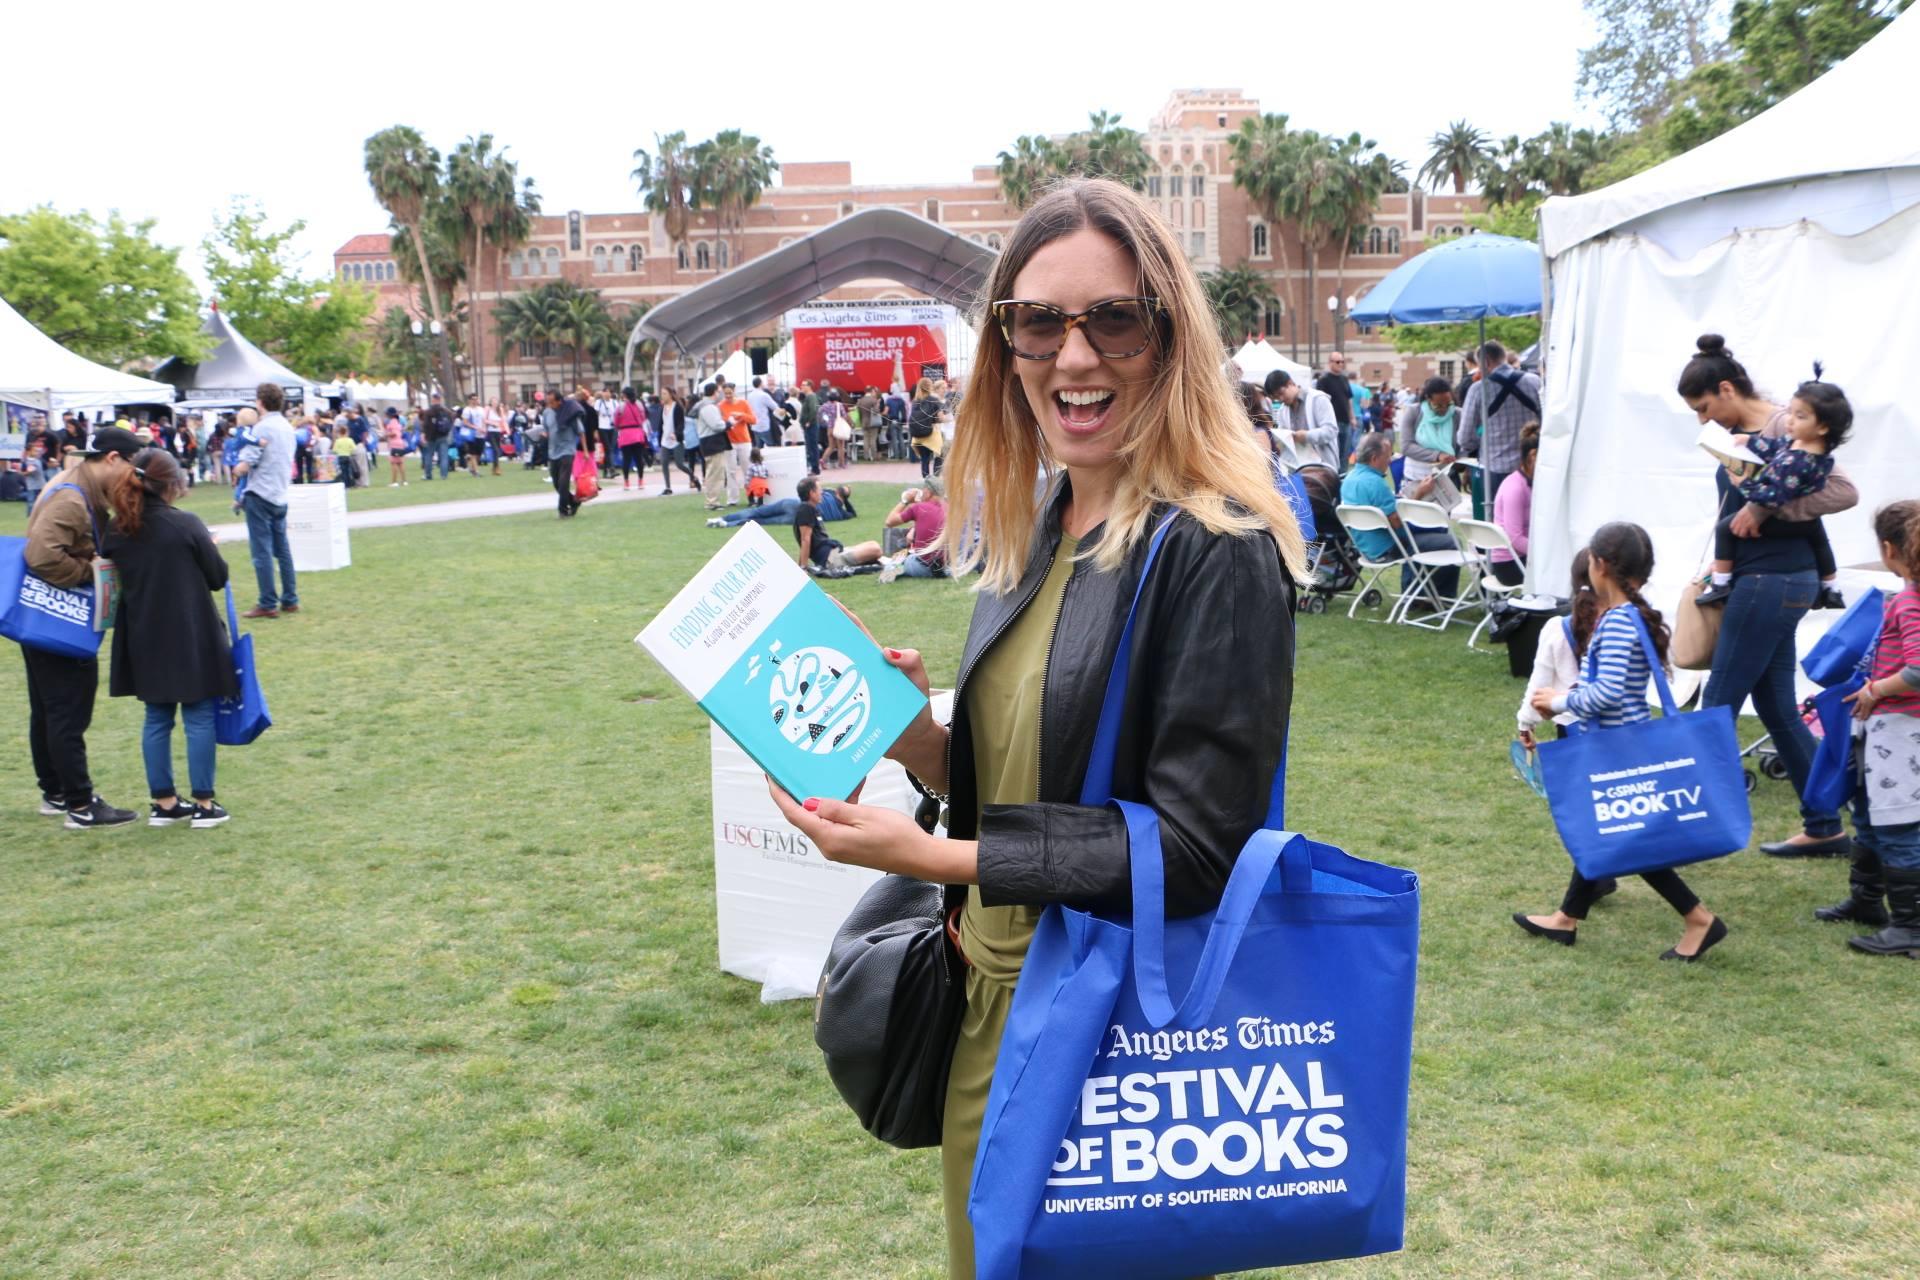 LA Times Festival of Books, USA